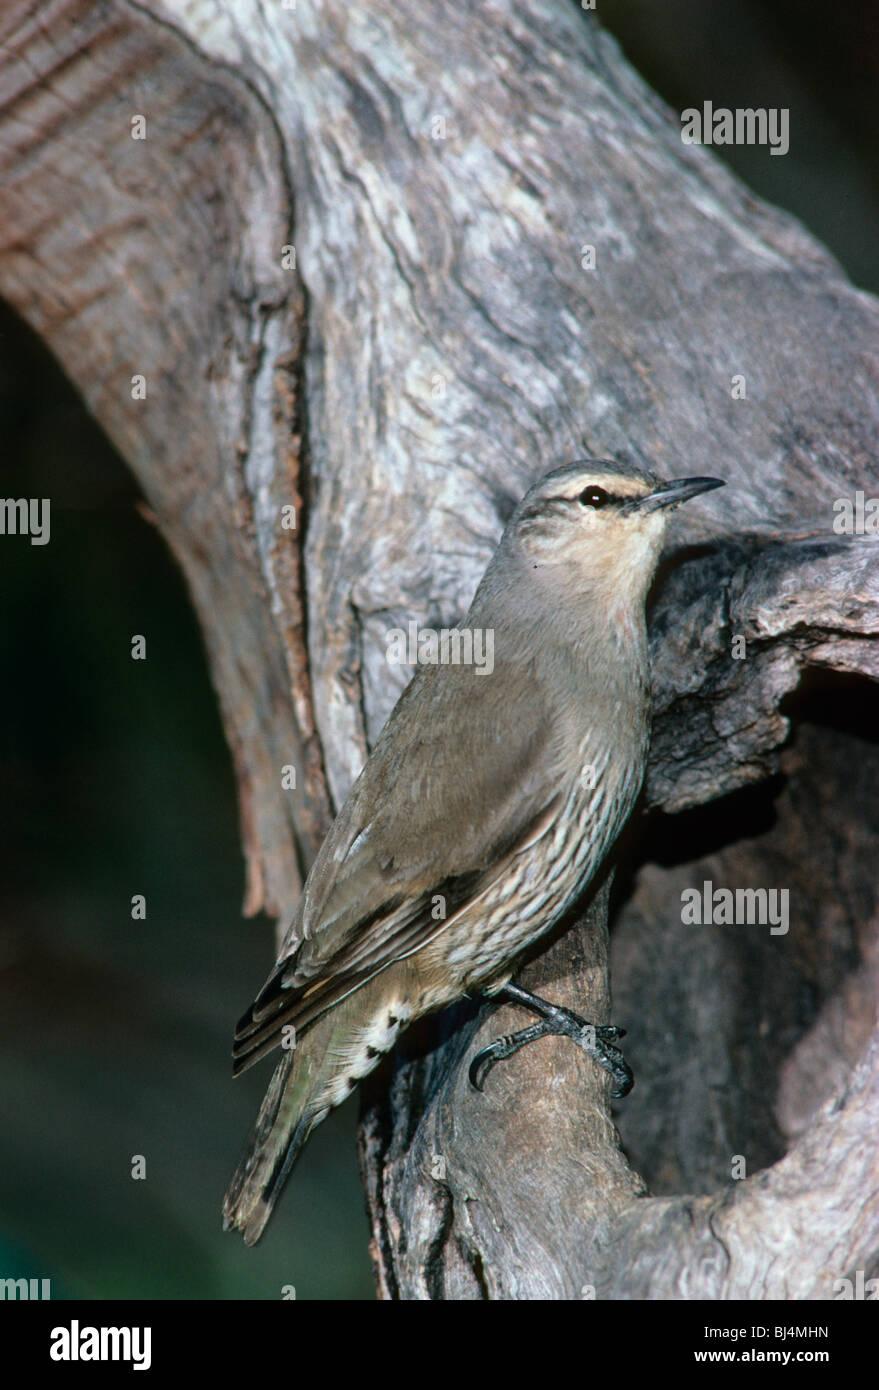 Brown Treecreeper (Climacteris picumnus) at nest hole, Australia - Stock Image